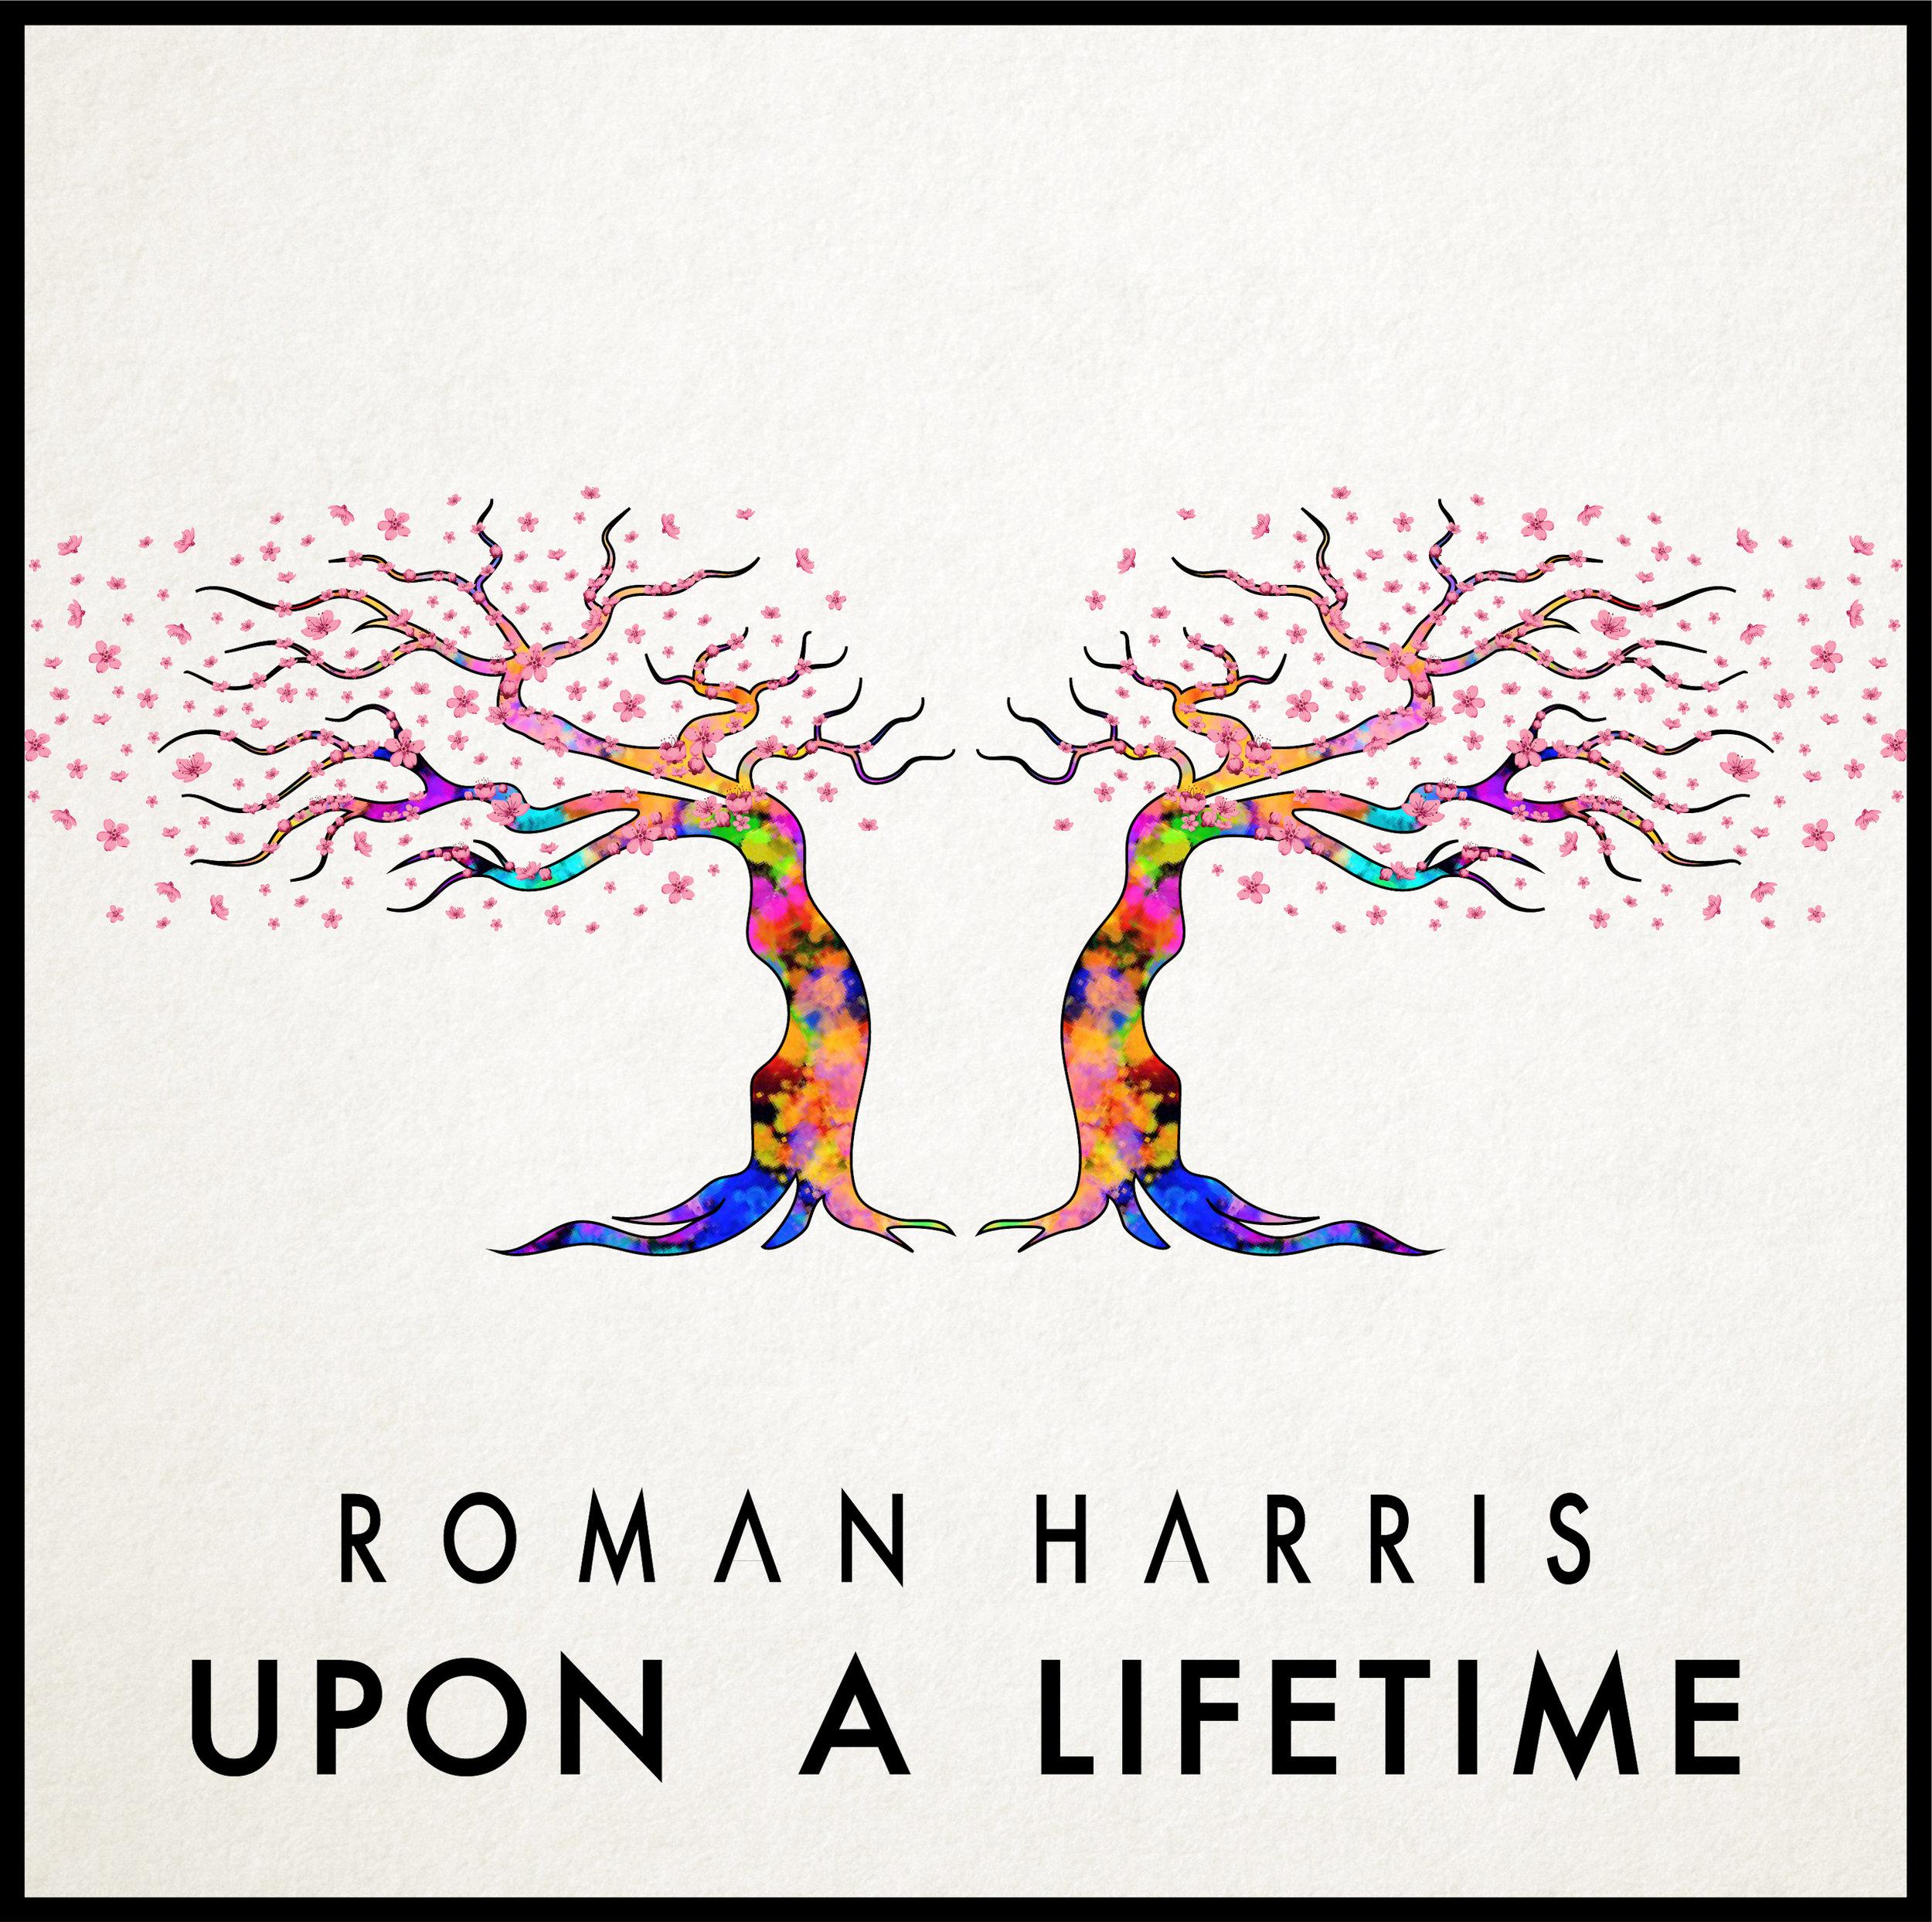 Roman Harris Upon a Lifetime